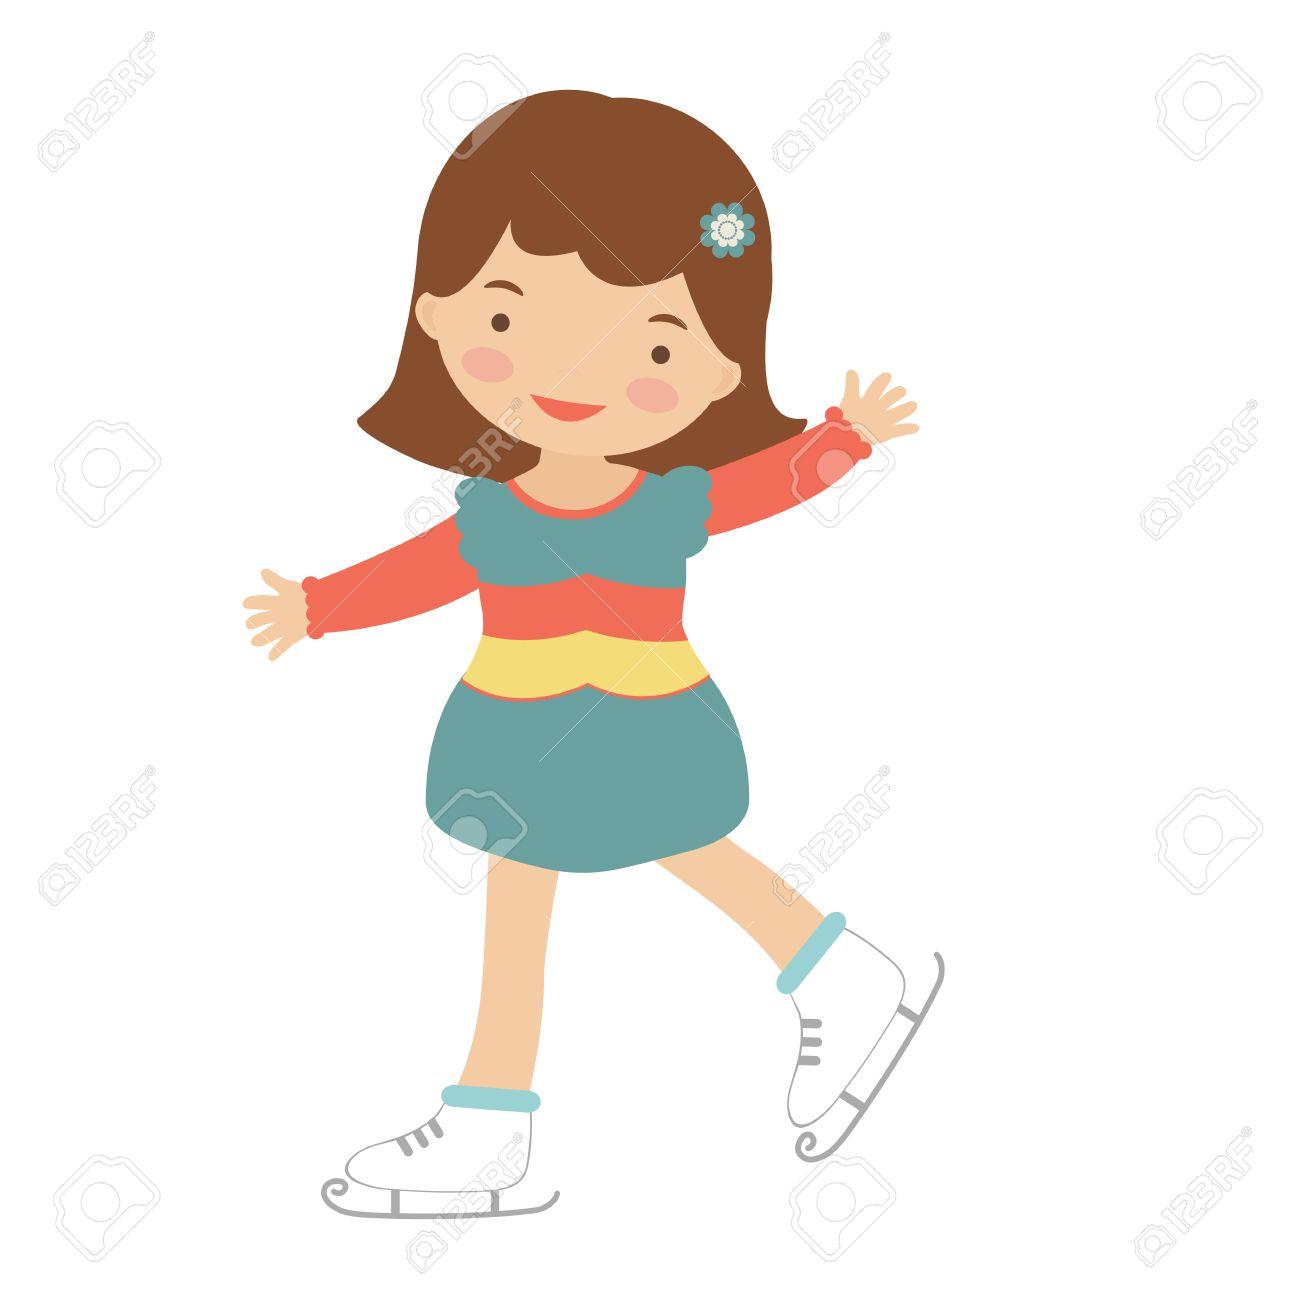 cute little girl ice skating illustration in vector format royalty rh 123rf com